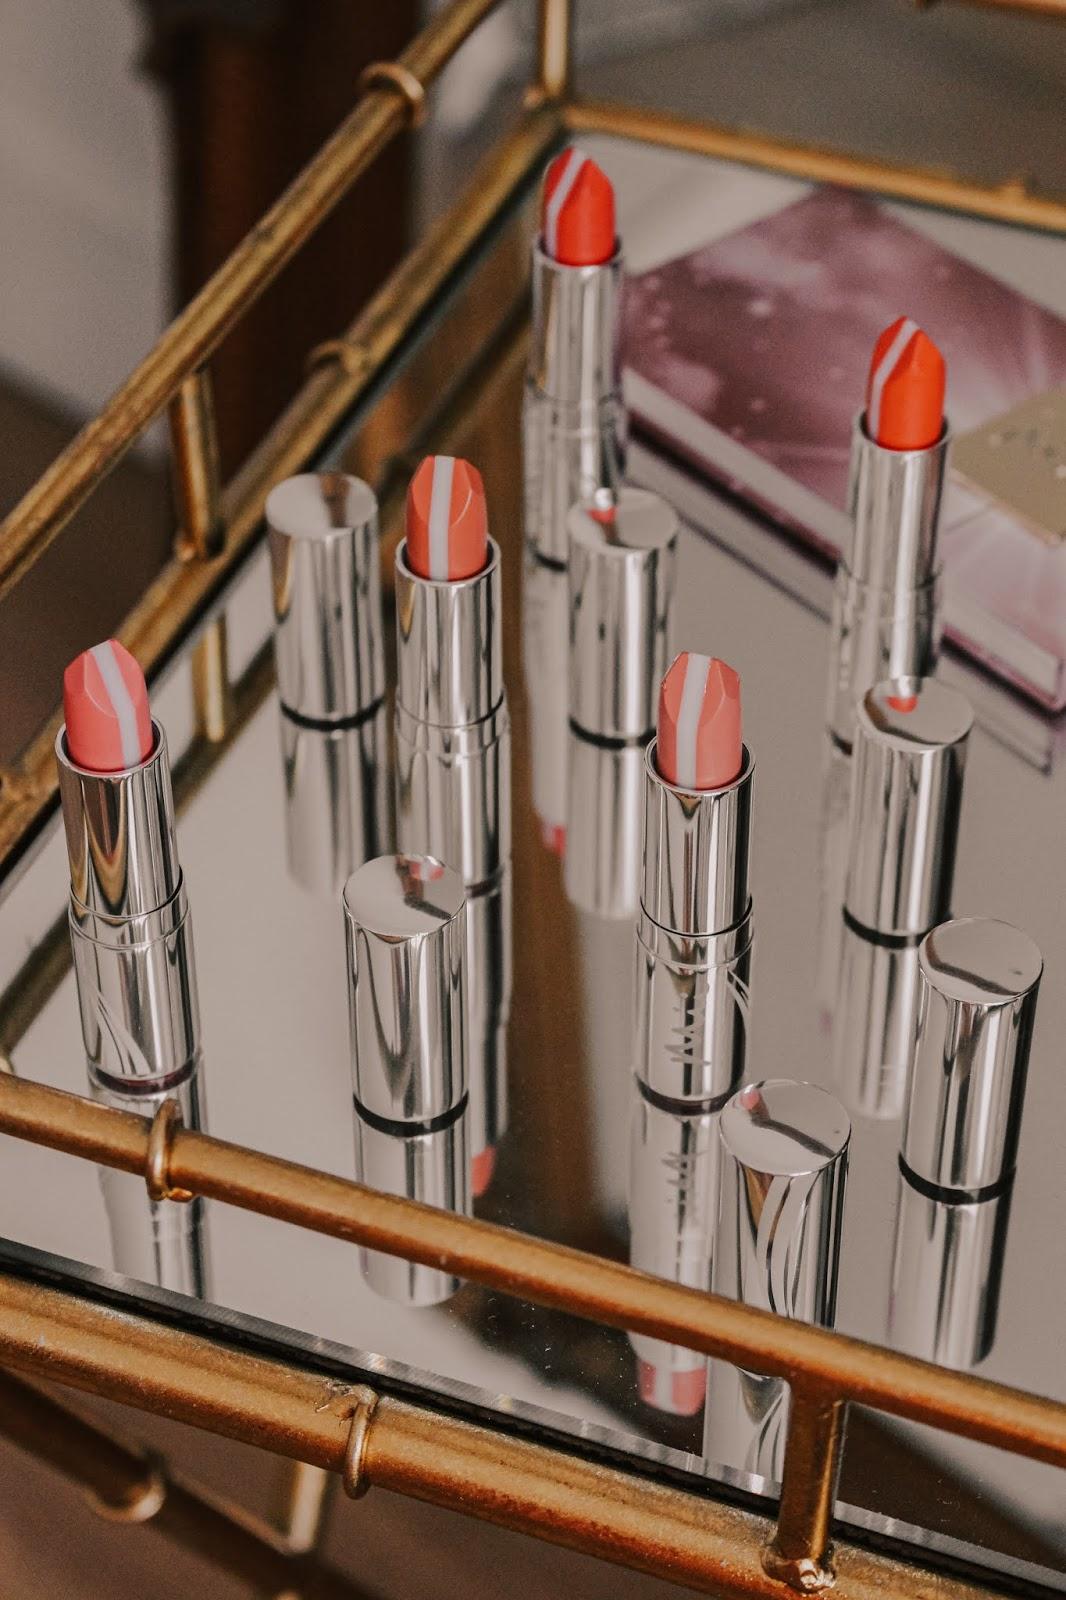 Mii Cosmetics HydraBoost Lipstick Review